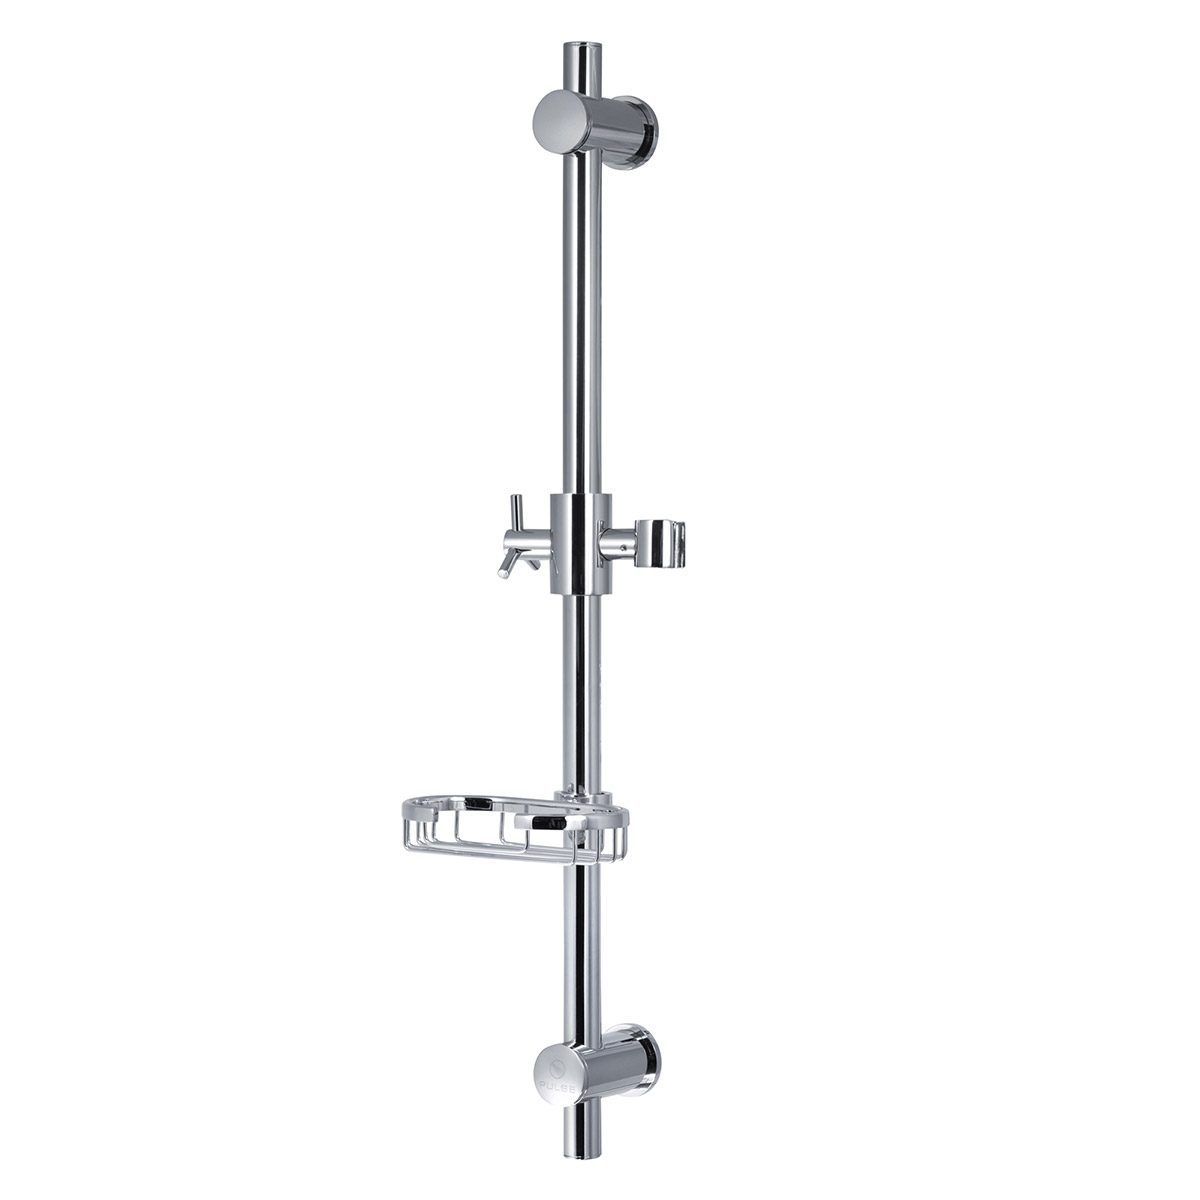 PULSE ShowerSpas Chrome Adjustable Slide Bar ShowerSpa Shower Panel Accessory